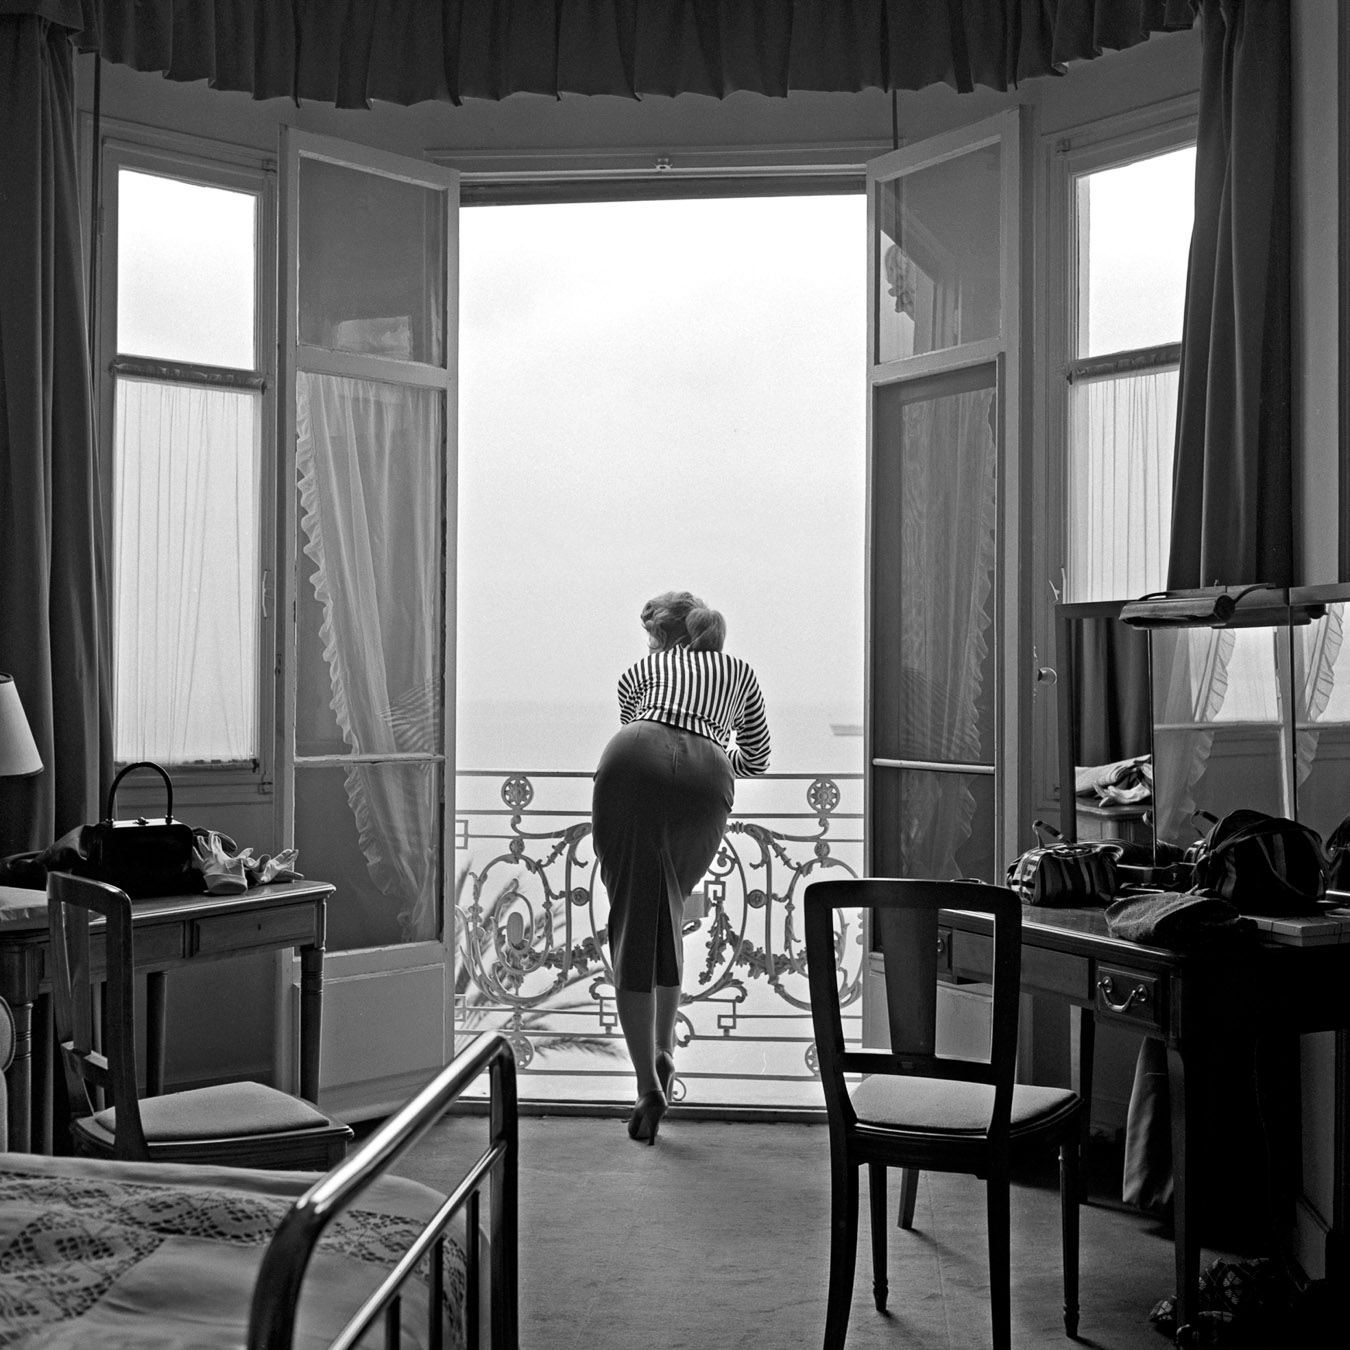 Sophia Loren, Carlton Hotel, Cannes 1955, Silver gelatin print 94x94cm, Also available: 40x50cm